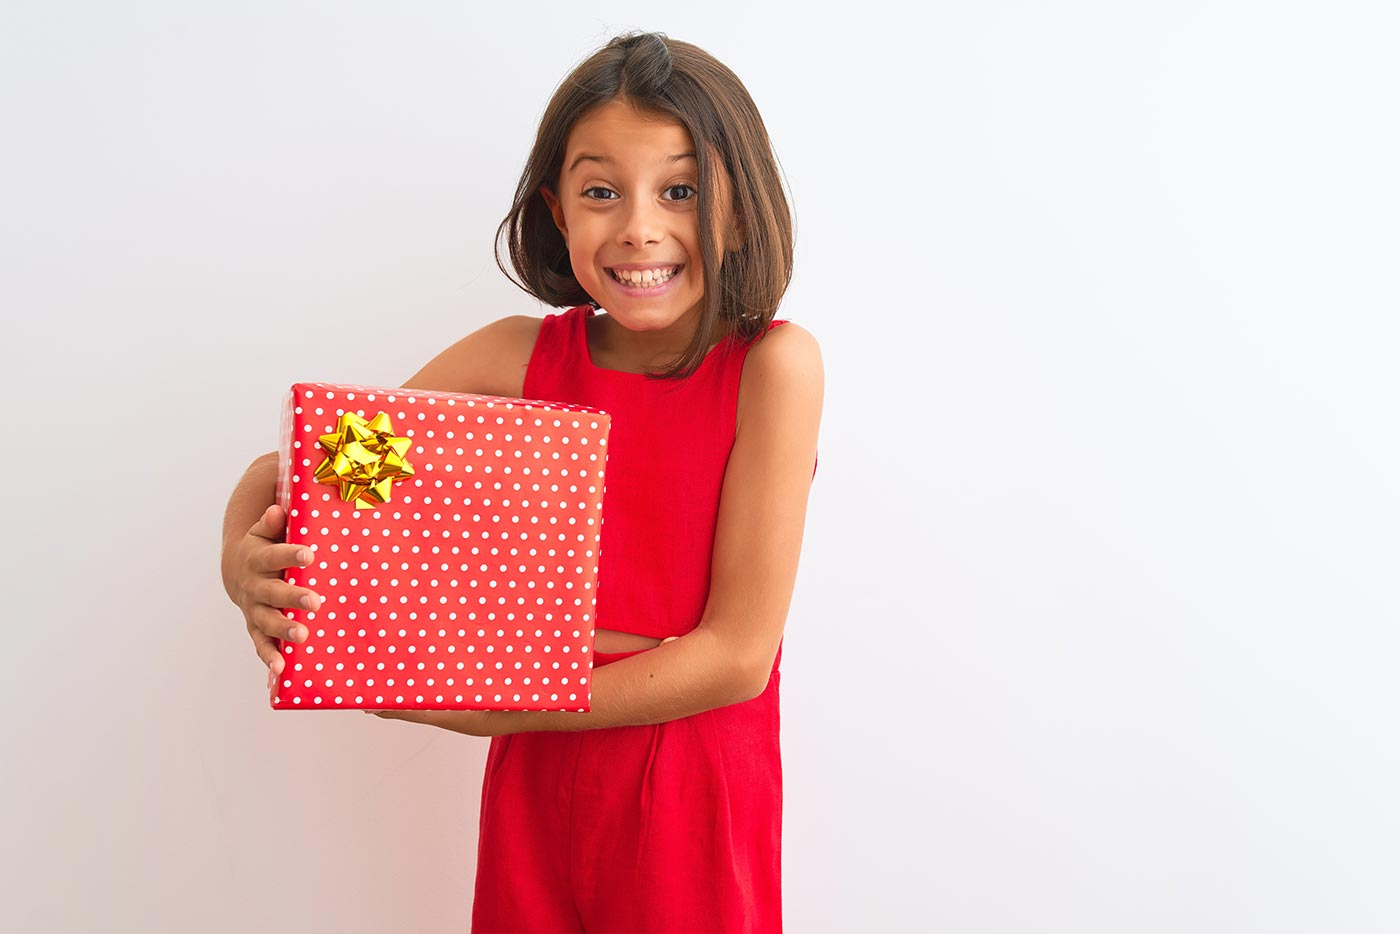 Child holding a birthday gift